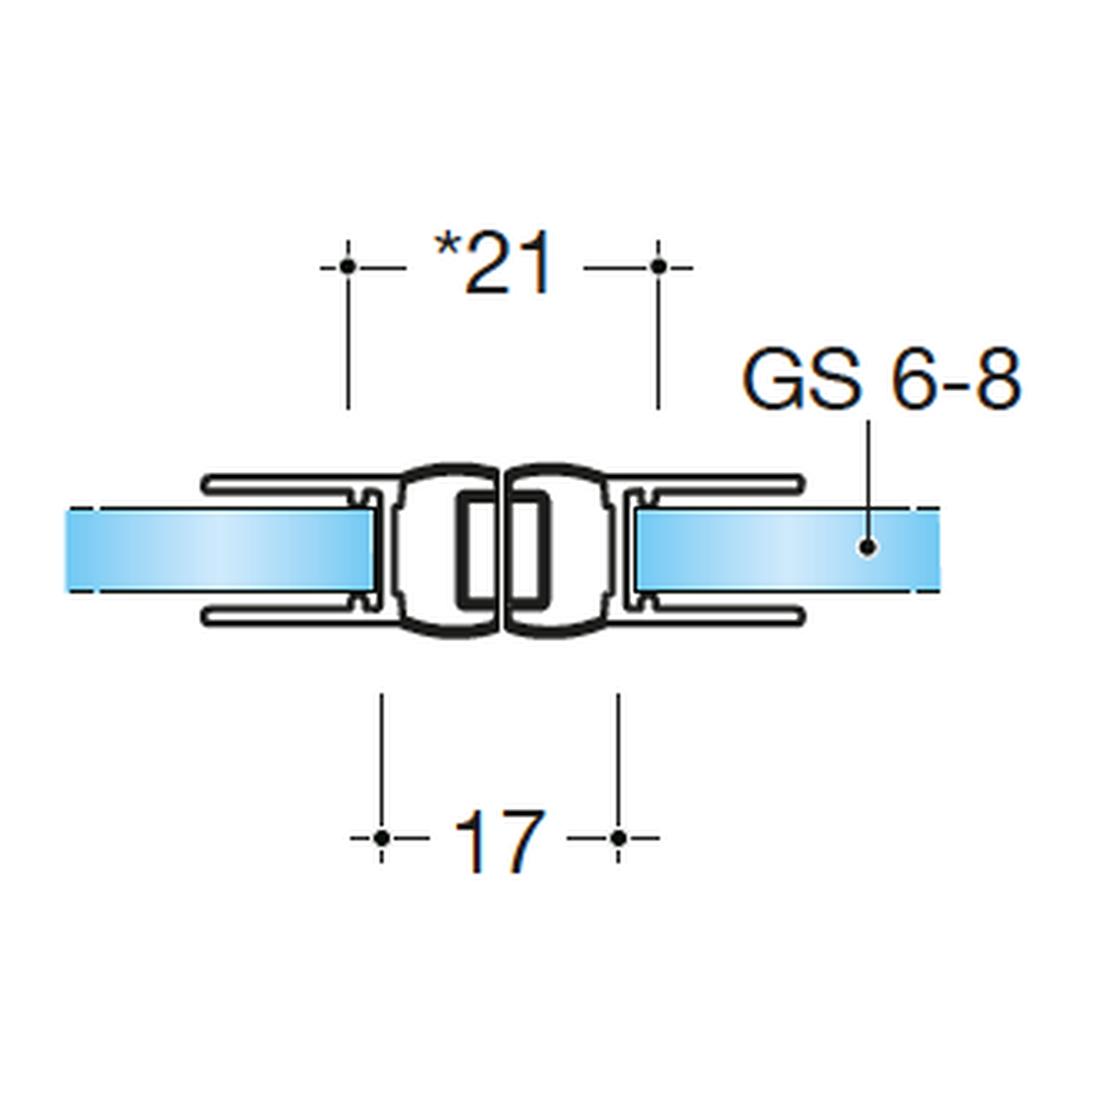 MAGNETDICHTUNG 180° GLAS-GLAS, GLASSTÄRKE 6-8MM